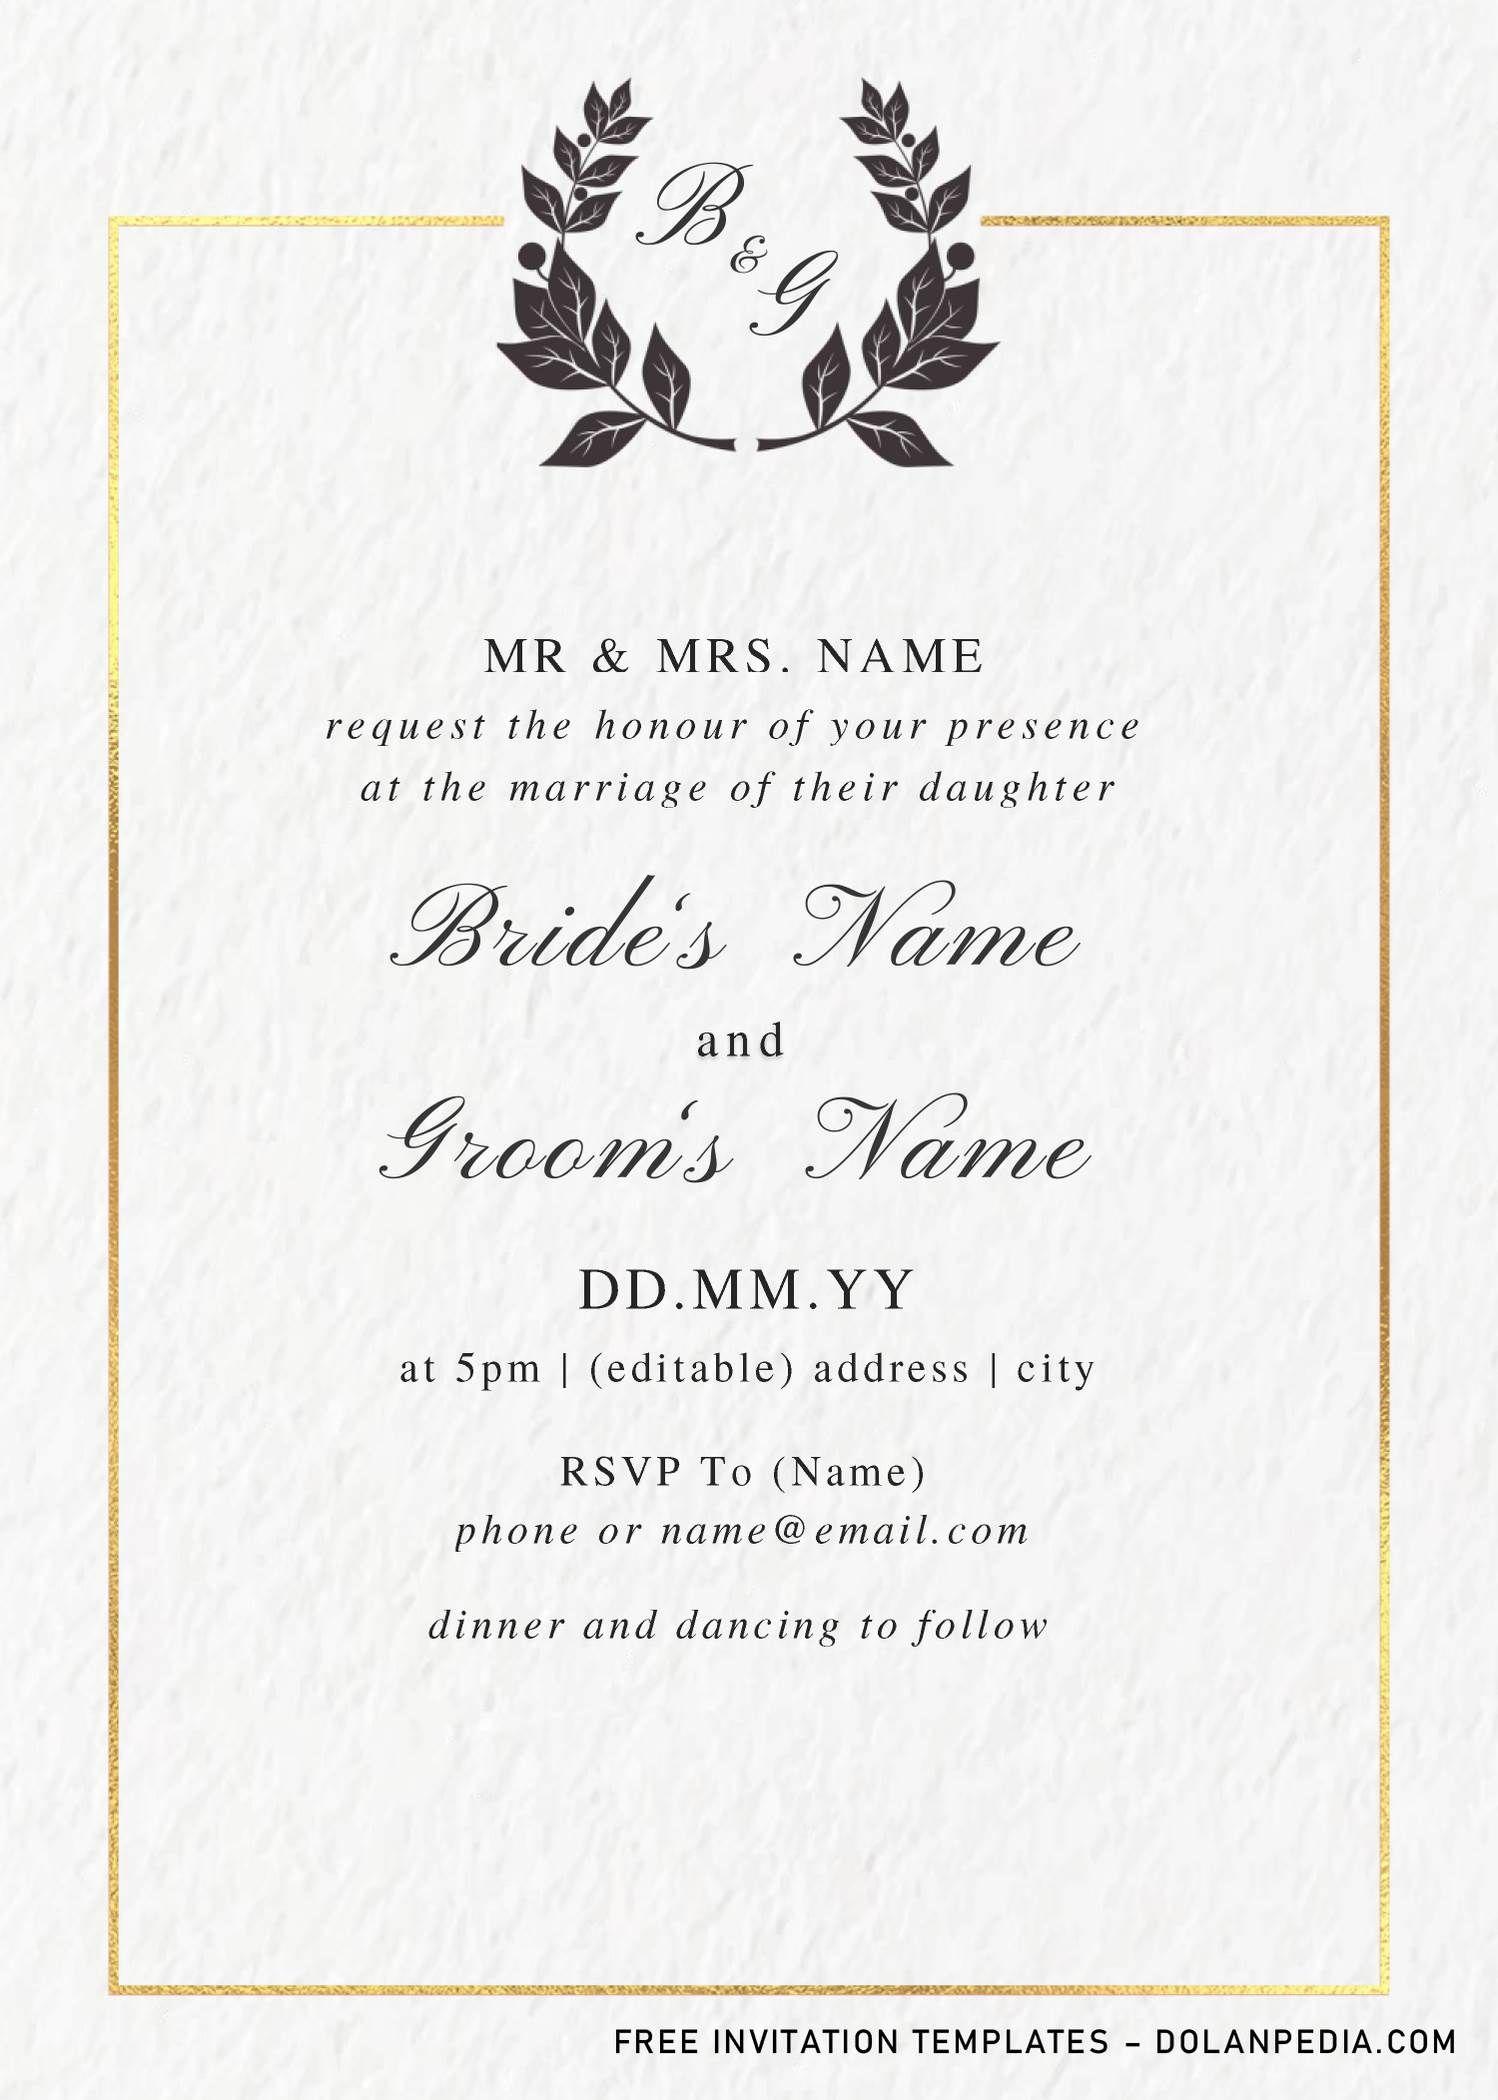 Monogram Wedding Invitation Templates Editable With Ms Word Monogram Wedding Invitations Wedding Invitation Templates Invitation Template - ms word wedding invitation templates